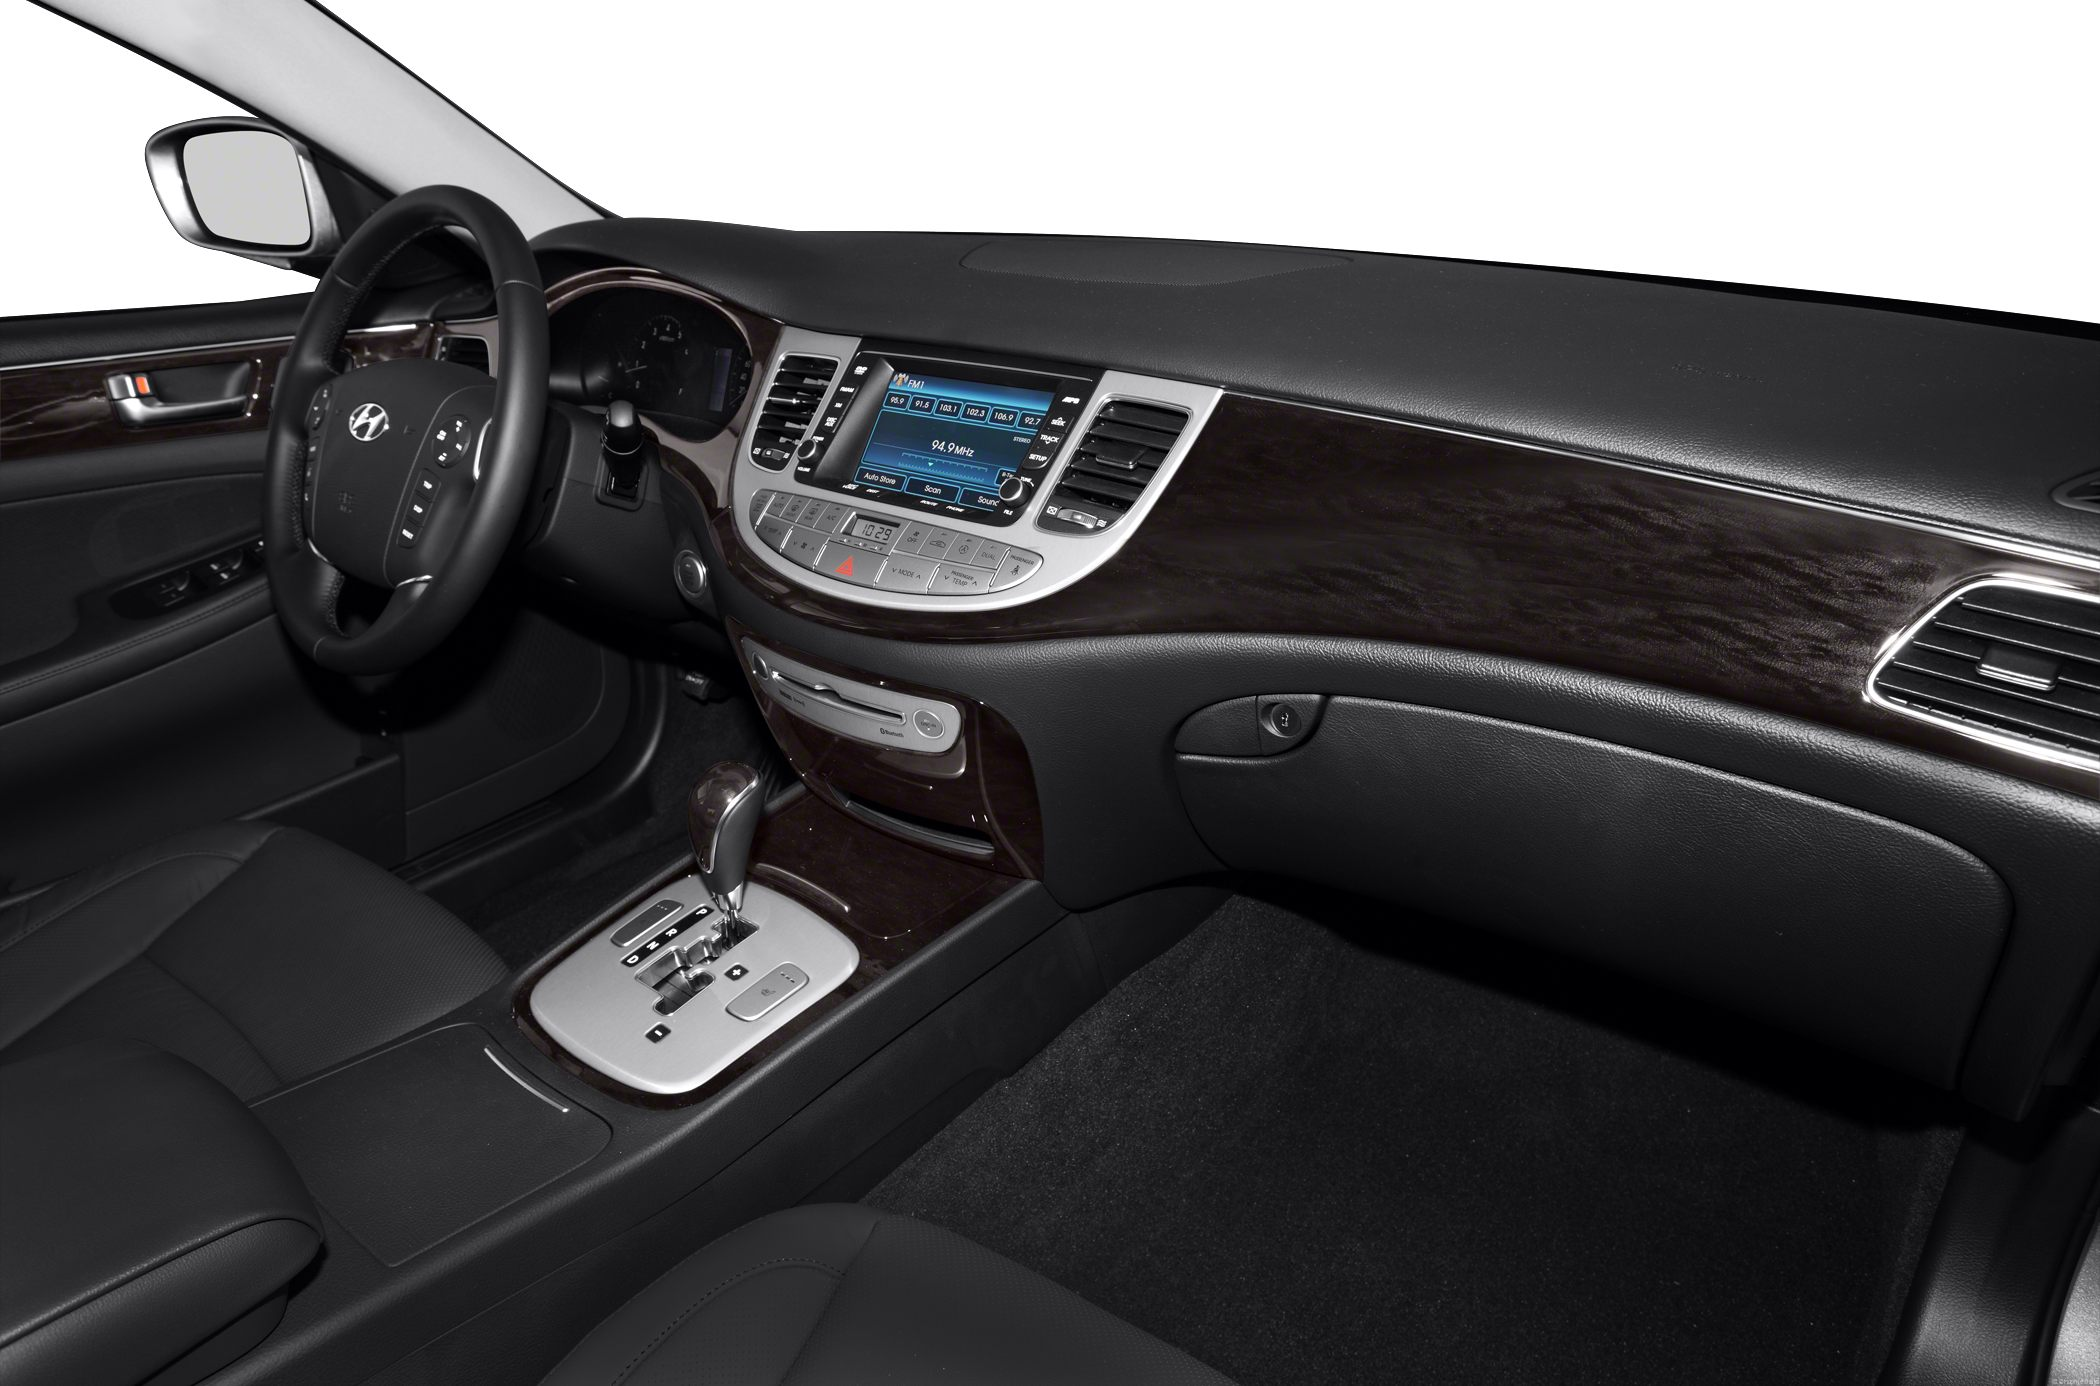 2013 Hyundai Genesis #3 Hyundai Genesis #3